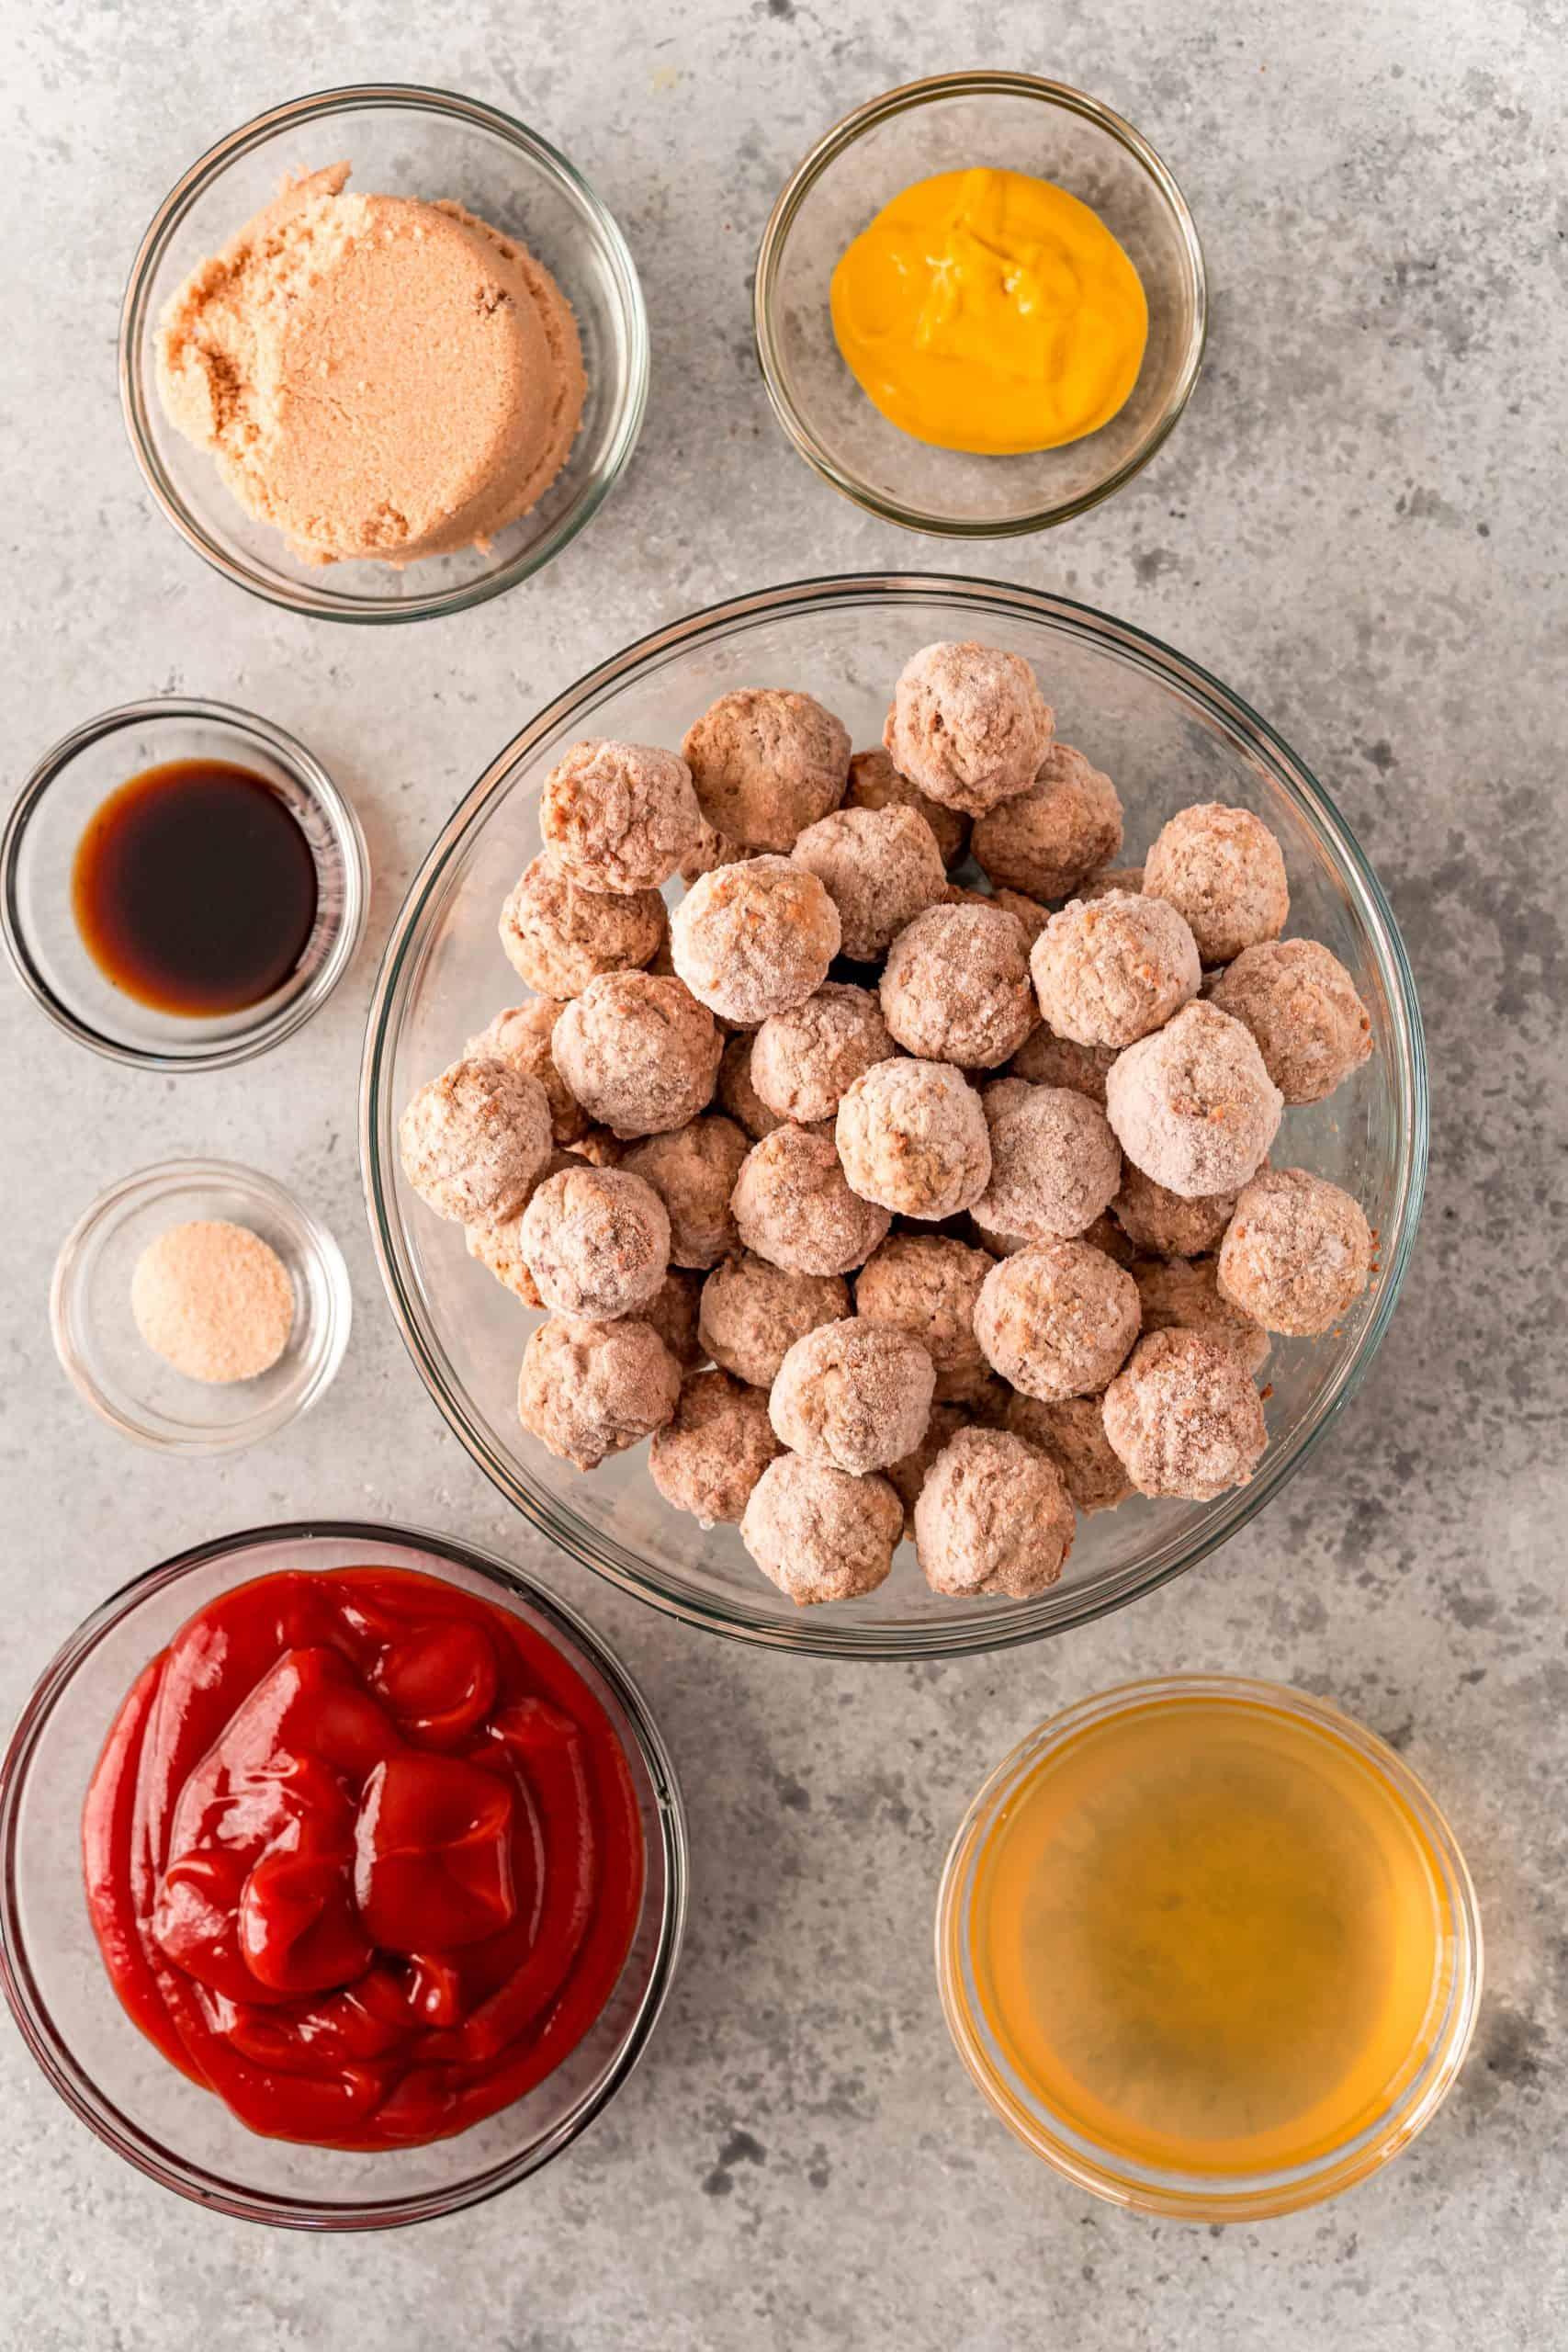 Ingredients needed to make Crock Pot Meatloaf Meatballs: meatballs, ketchup, brown sugar, beef broth, mustard, worcestershire sauce, onion powder